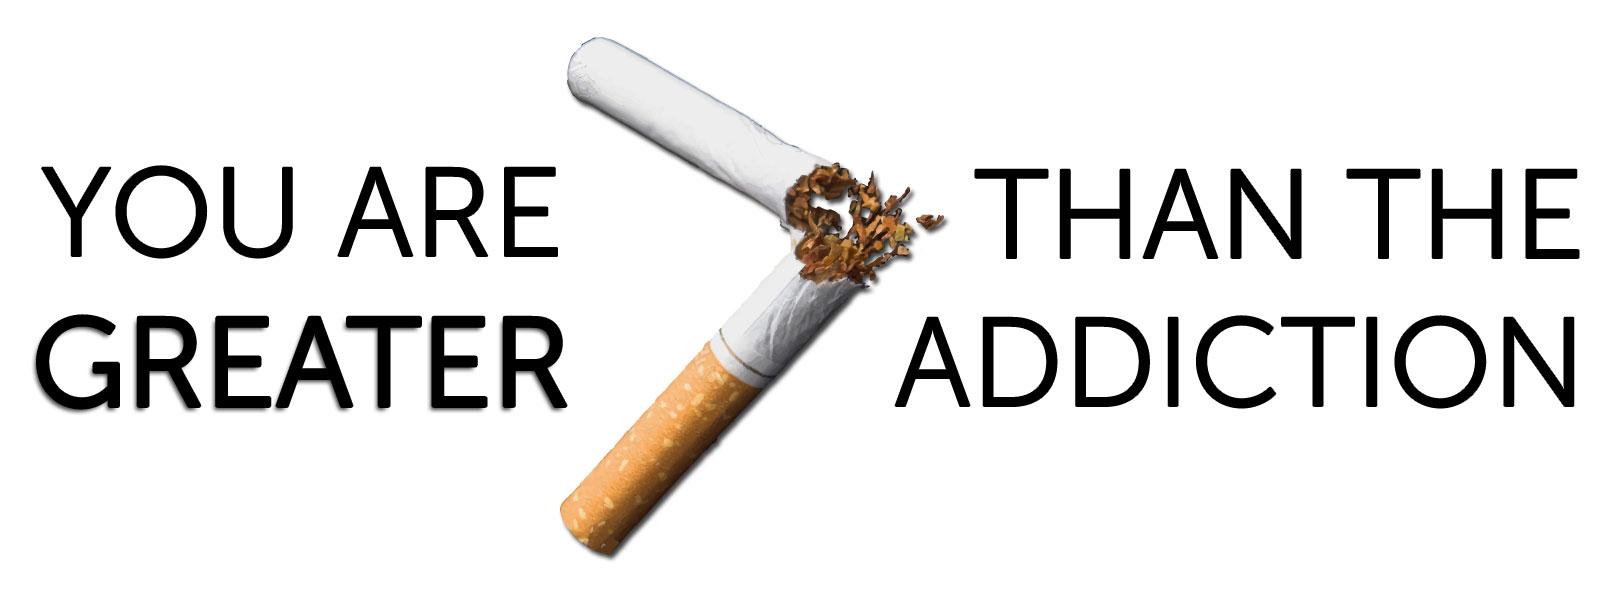 5 Ways to End Your Smoking Habit